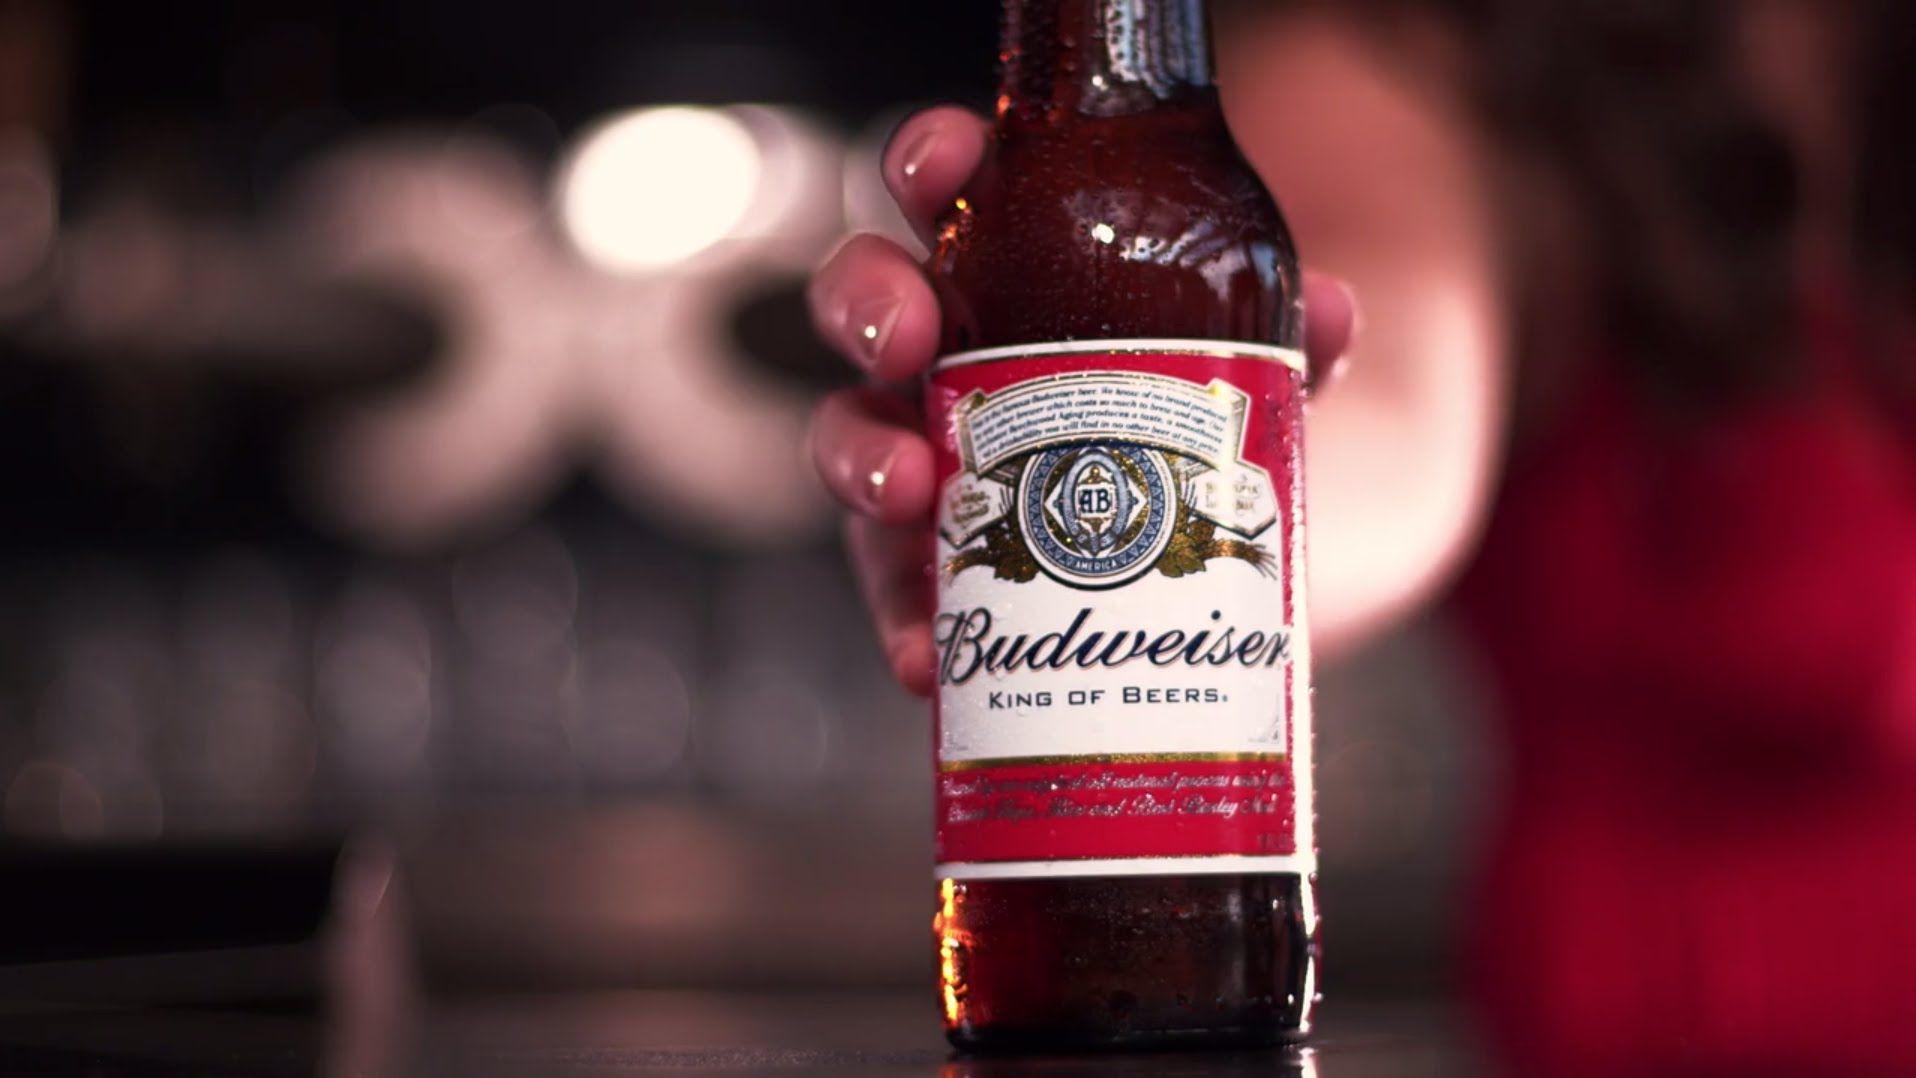 budweiser beer calories - HD1916×1078